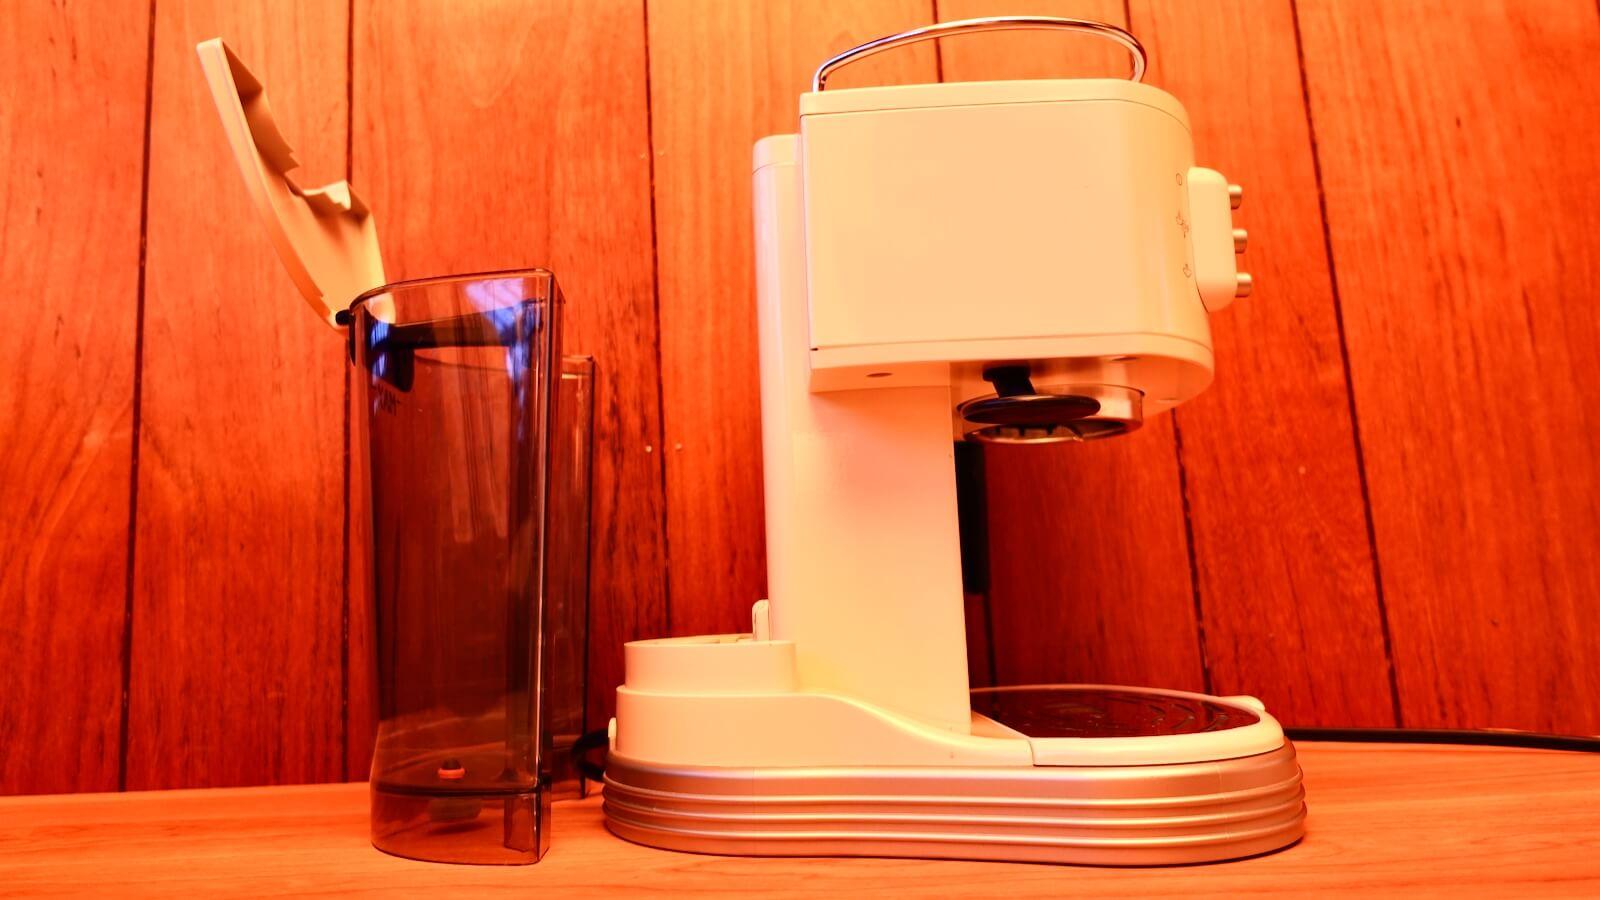 Delonghi espresso machine ECM300J water tank removal